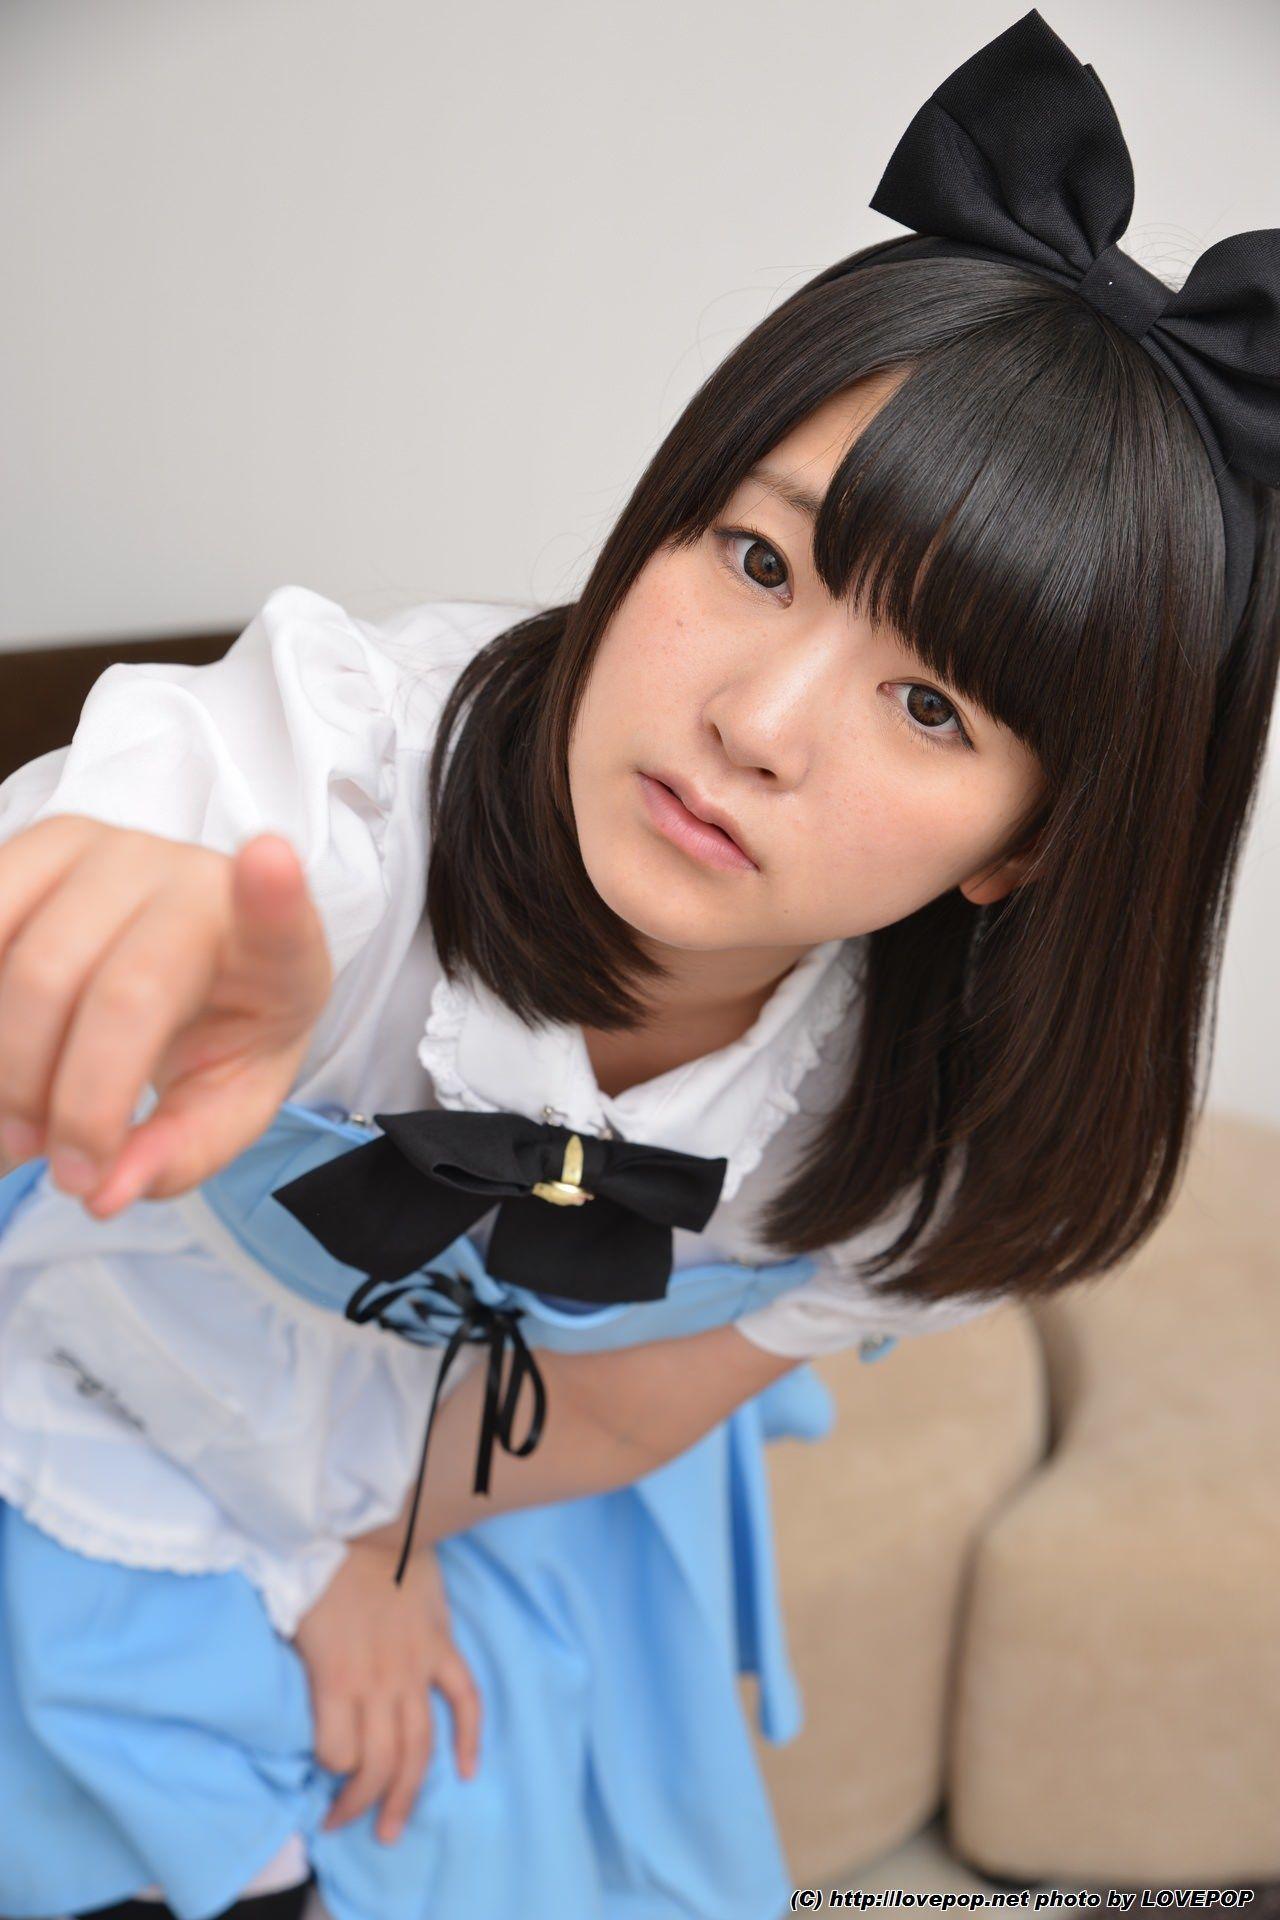 [LovePop] Tsuna Kimura 木村つな Maid Set03 写真集[65P]插图(8)